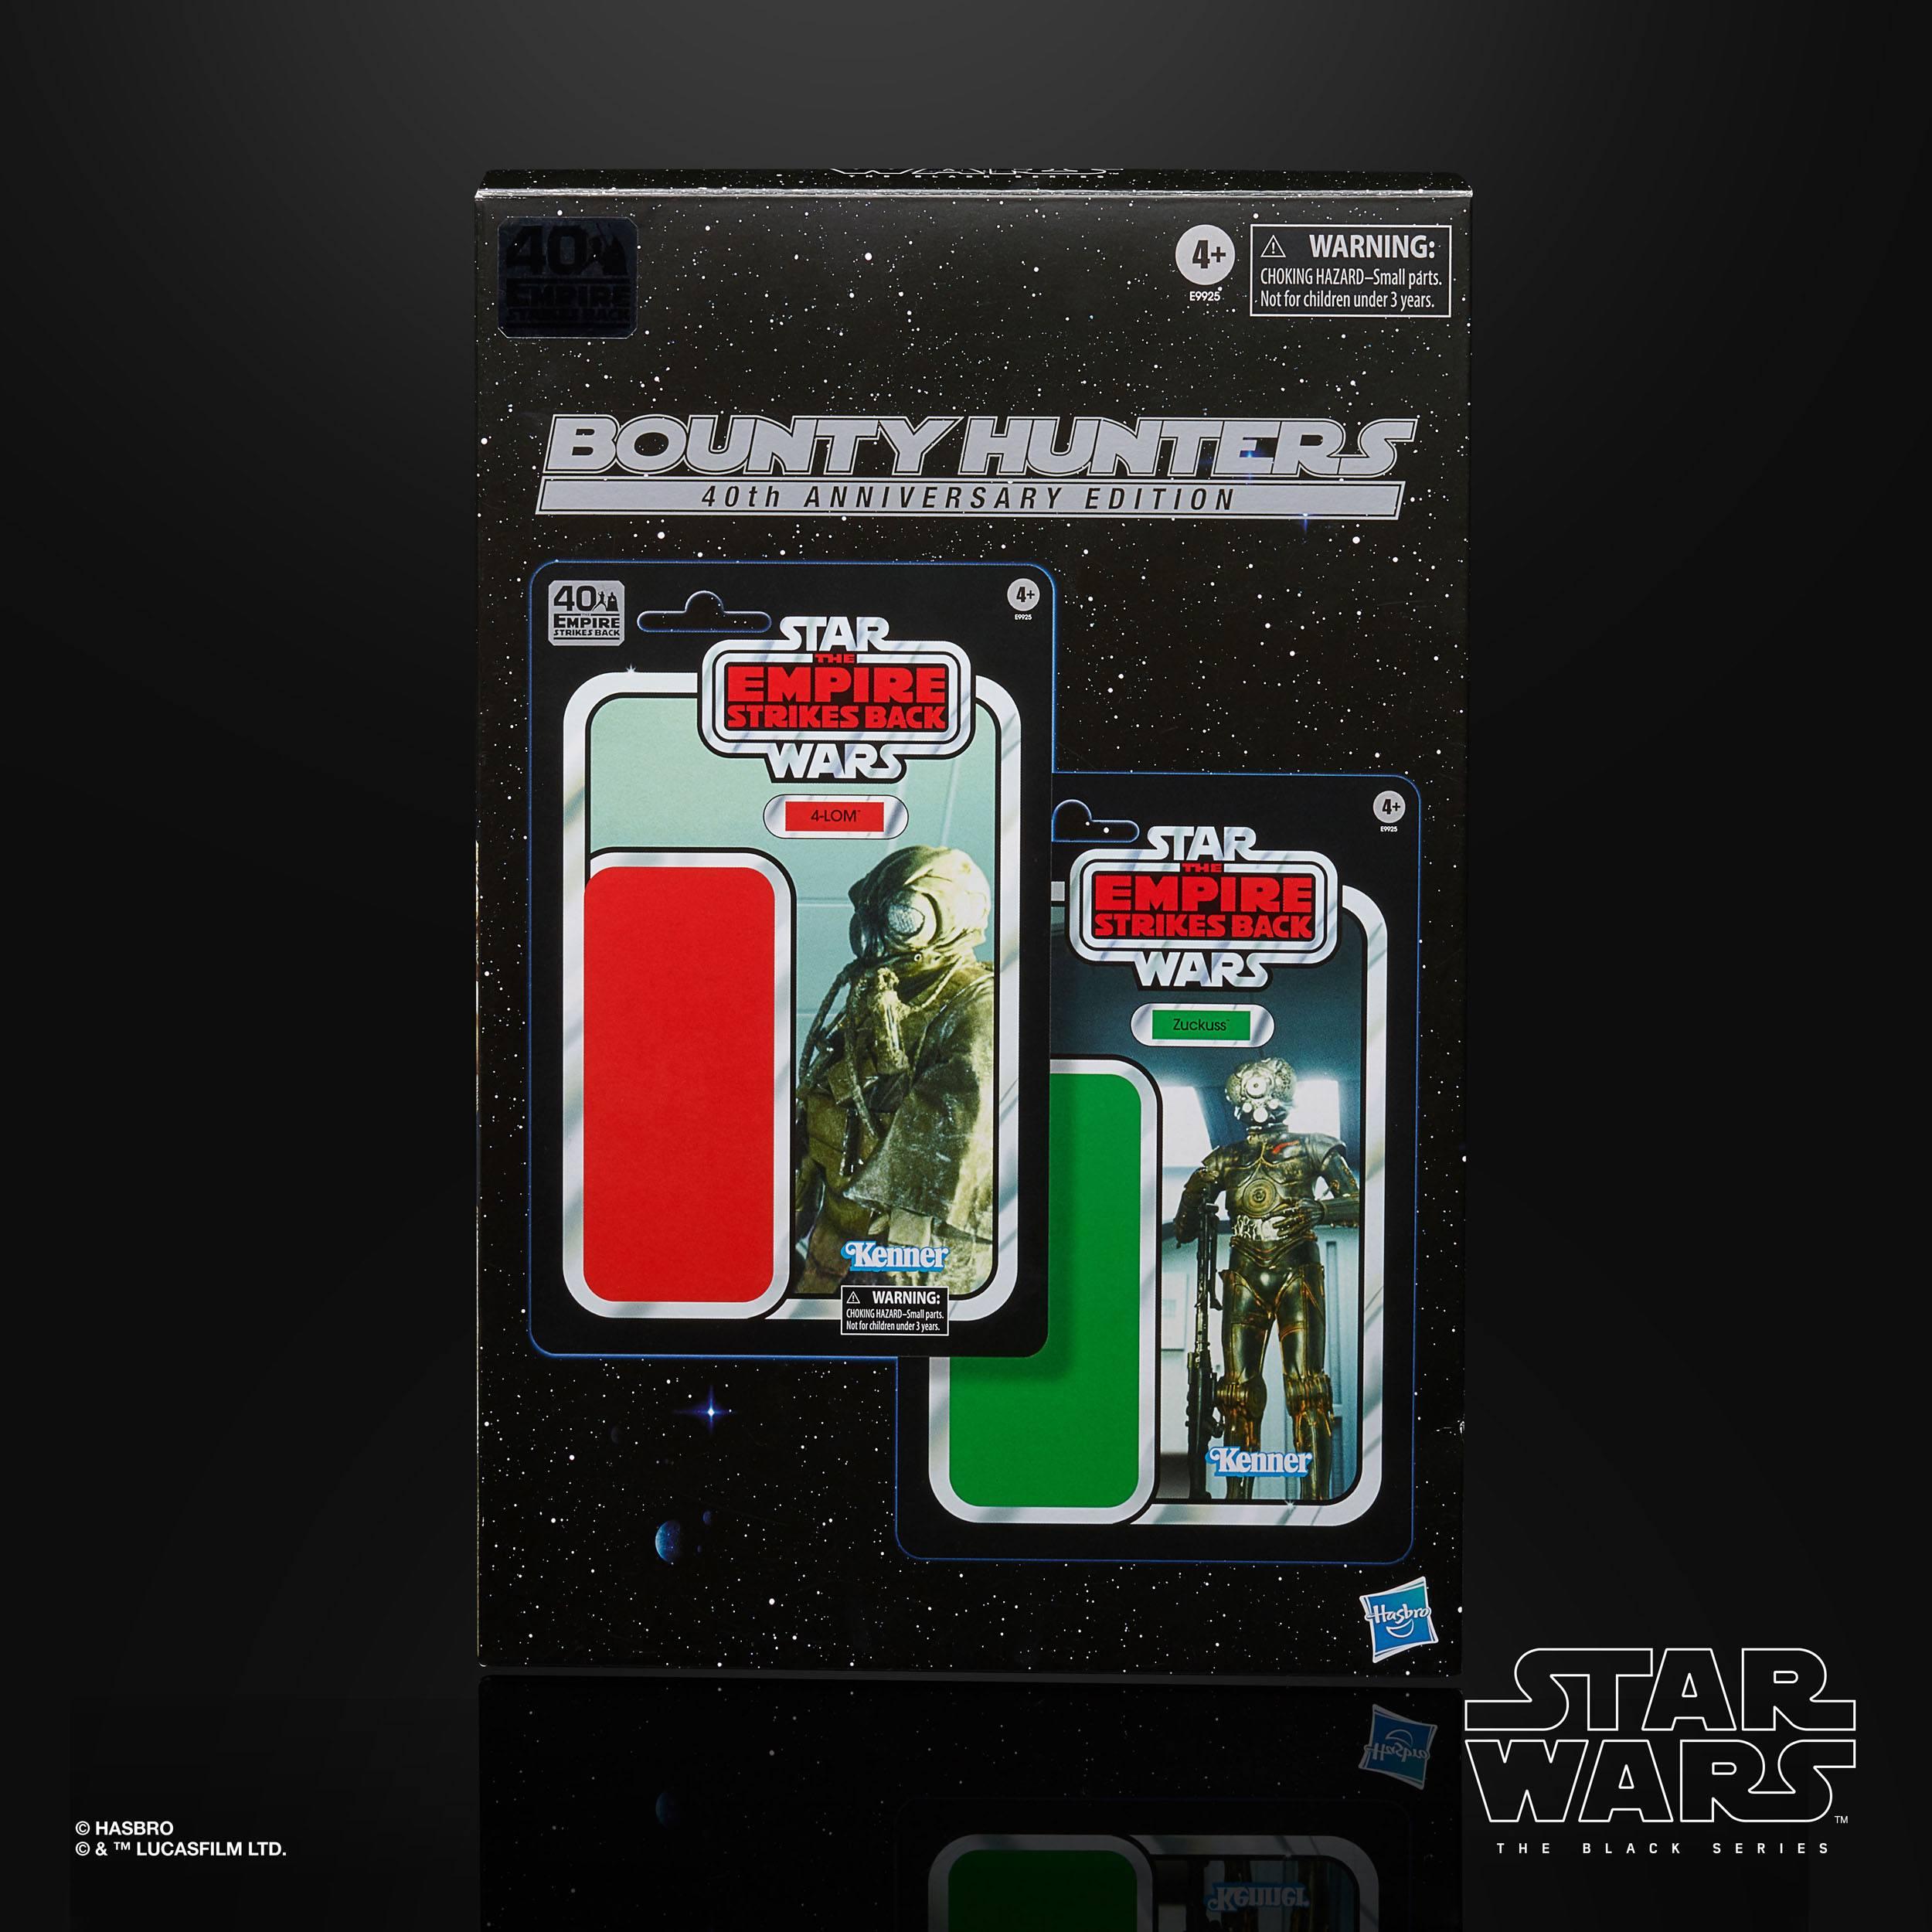 Star Wars Episode V Black Series Actionfiguren 2er-Pack Bounty Hunters 40th Anniversary Edition 15cm HASE9925 5010993743957